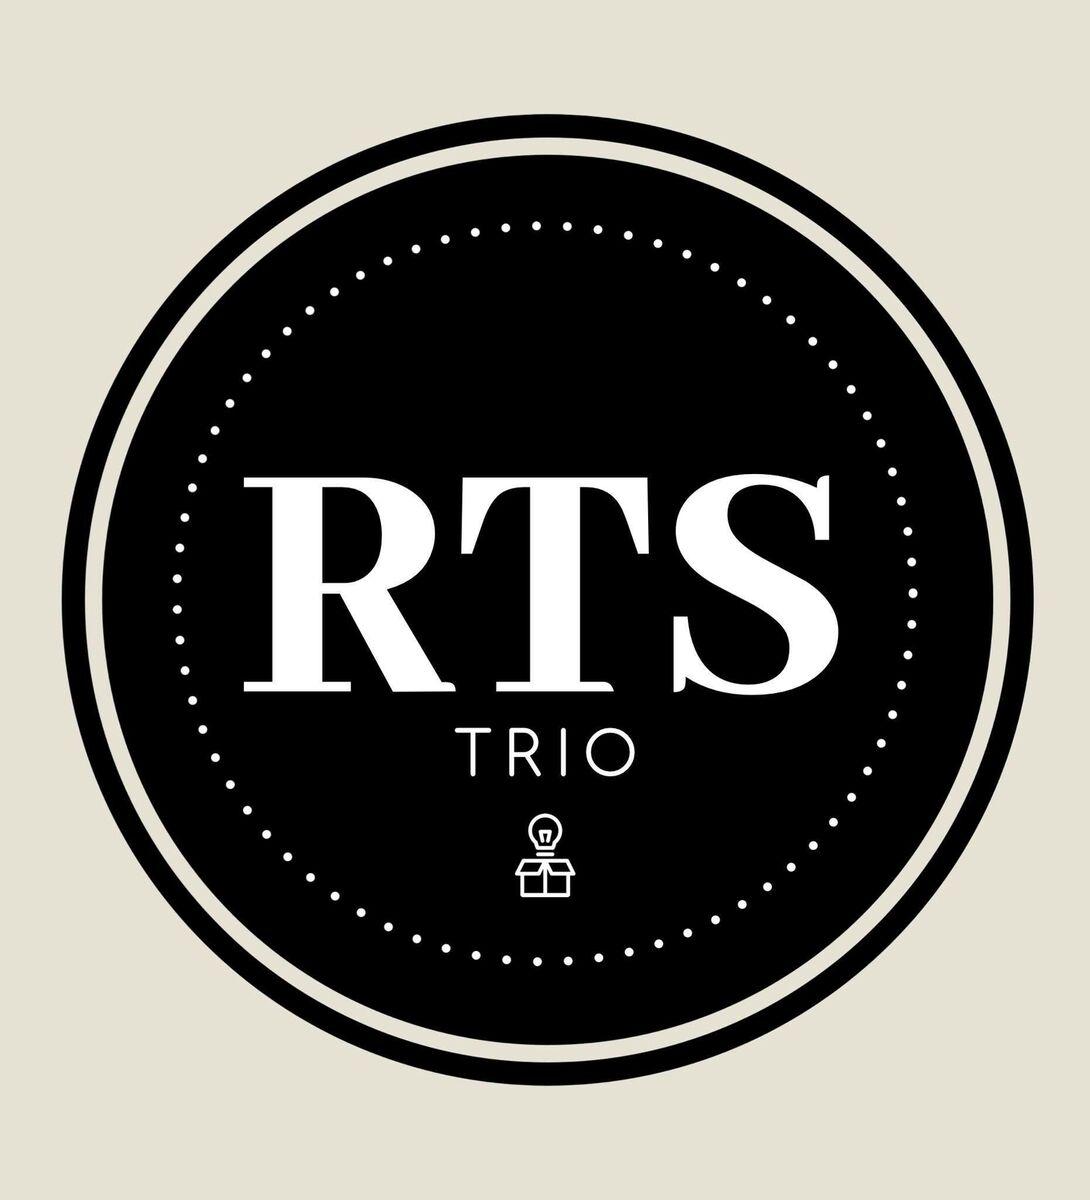 RTS TRIO